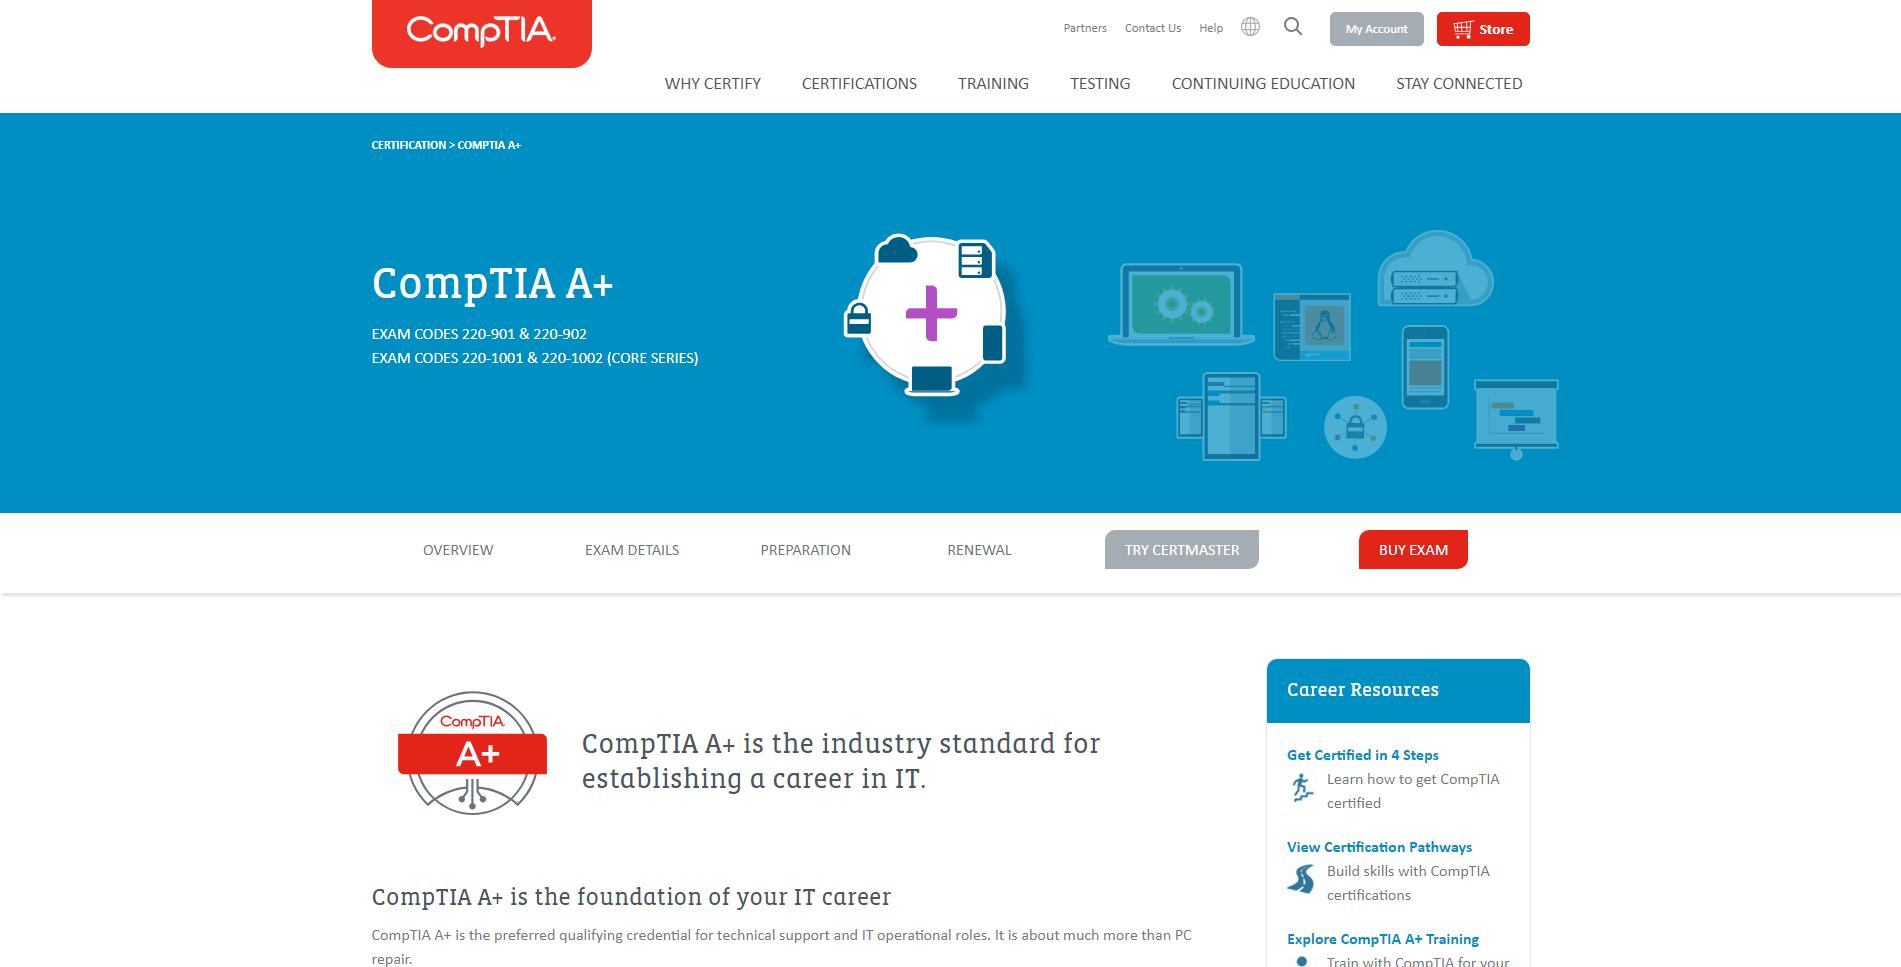 CompTIA A+ Technician